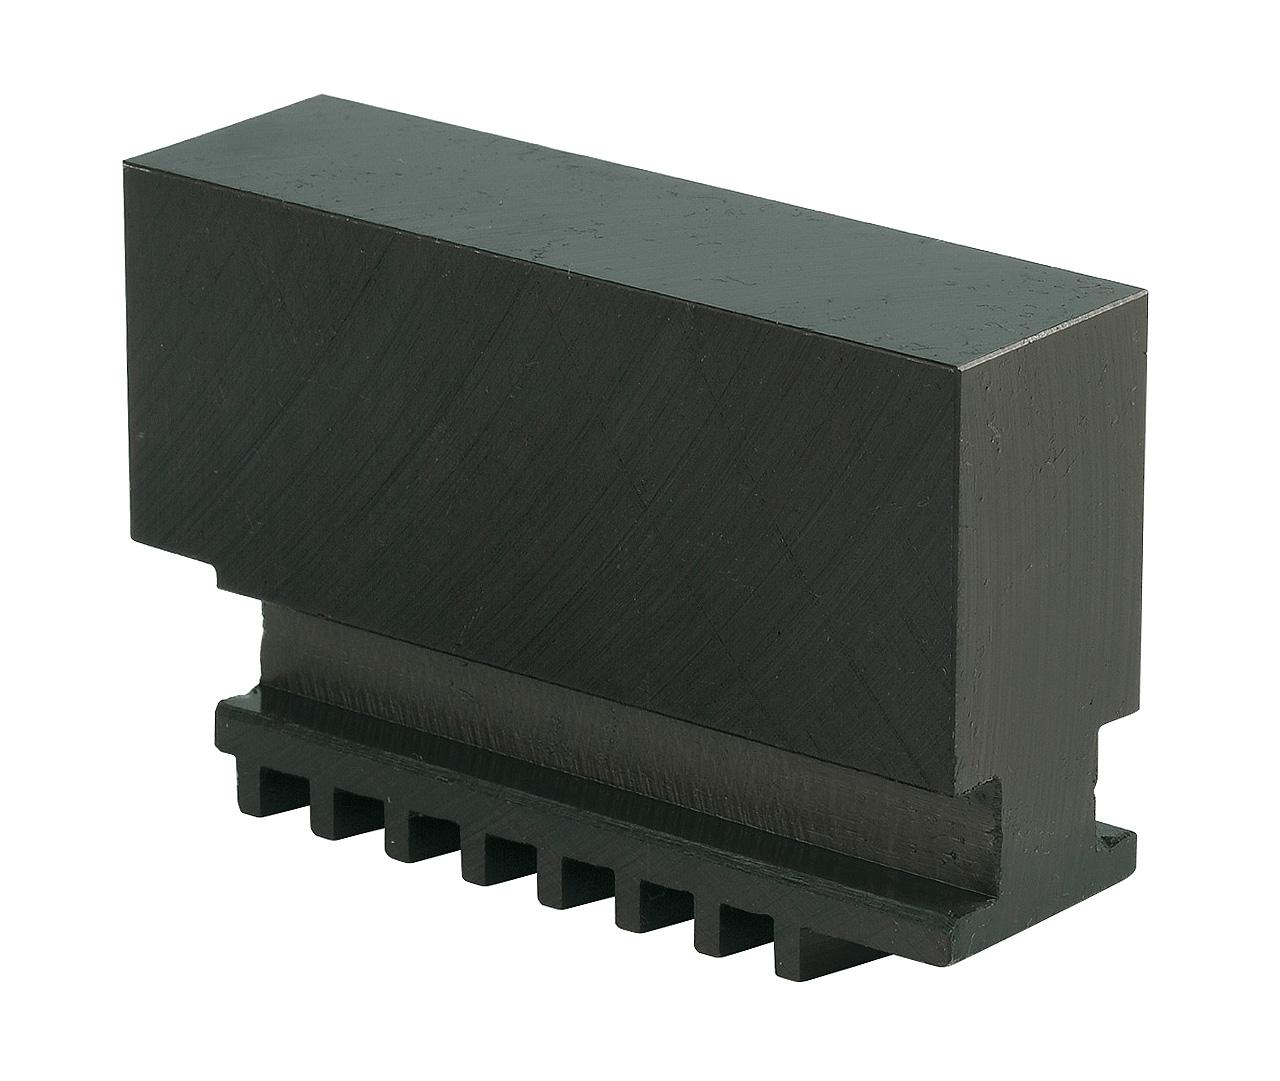 Szczęki jednolite miękkie - komplet DSJ-DK12-630 BERNARDO